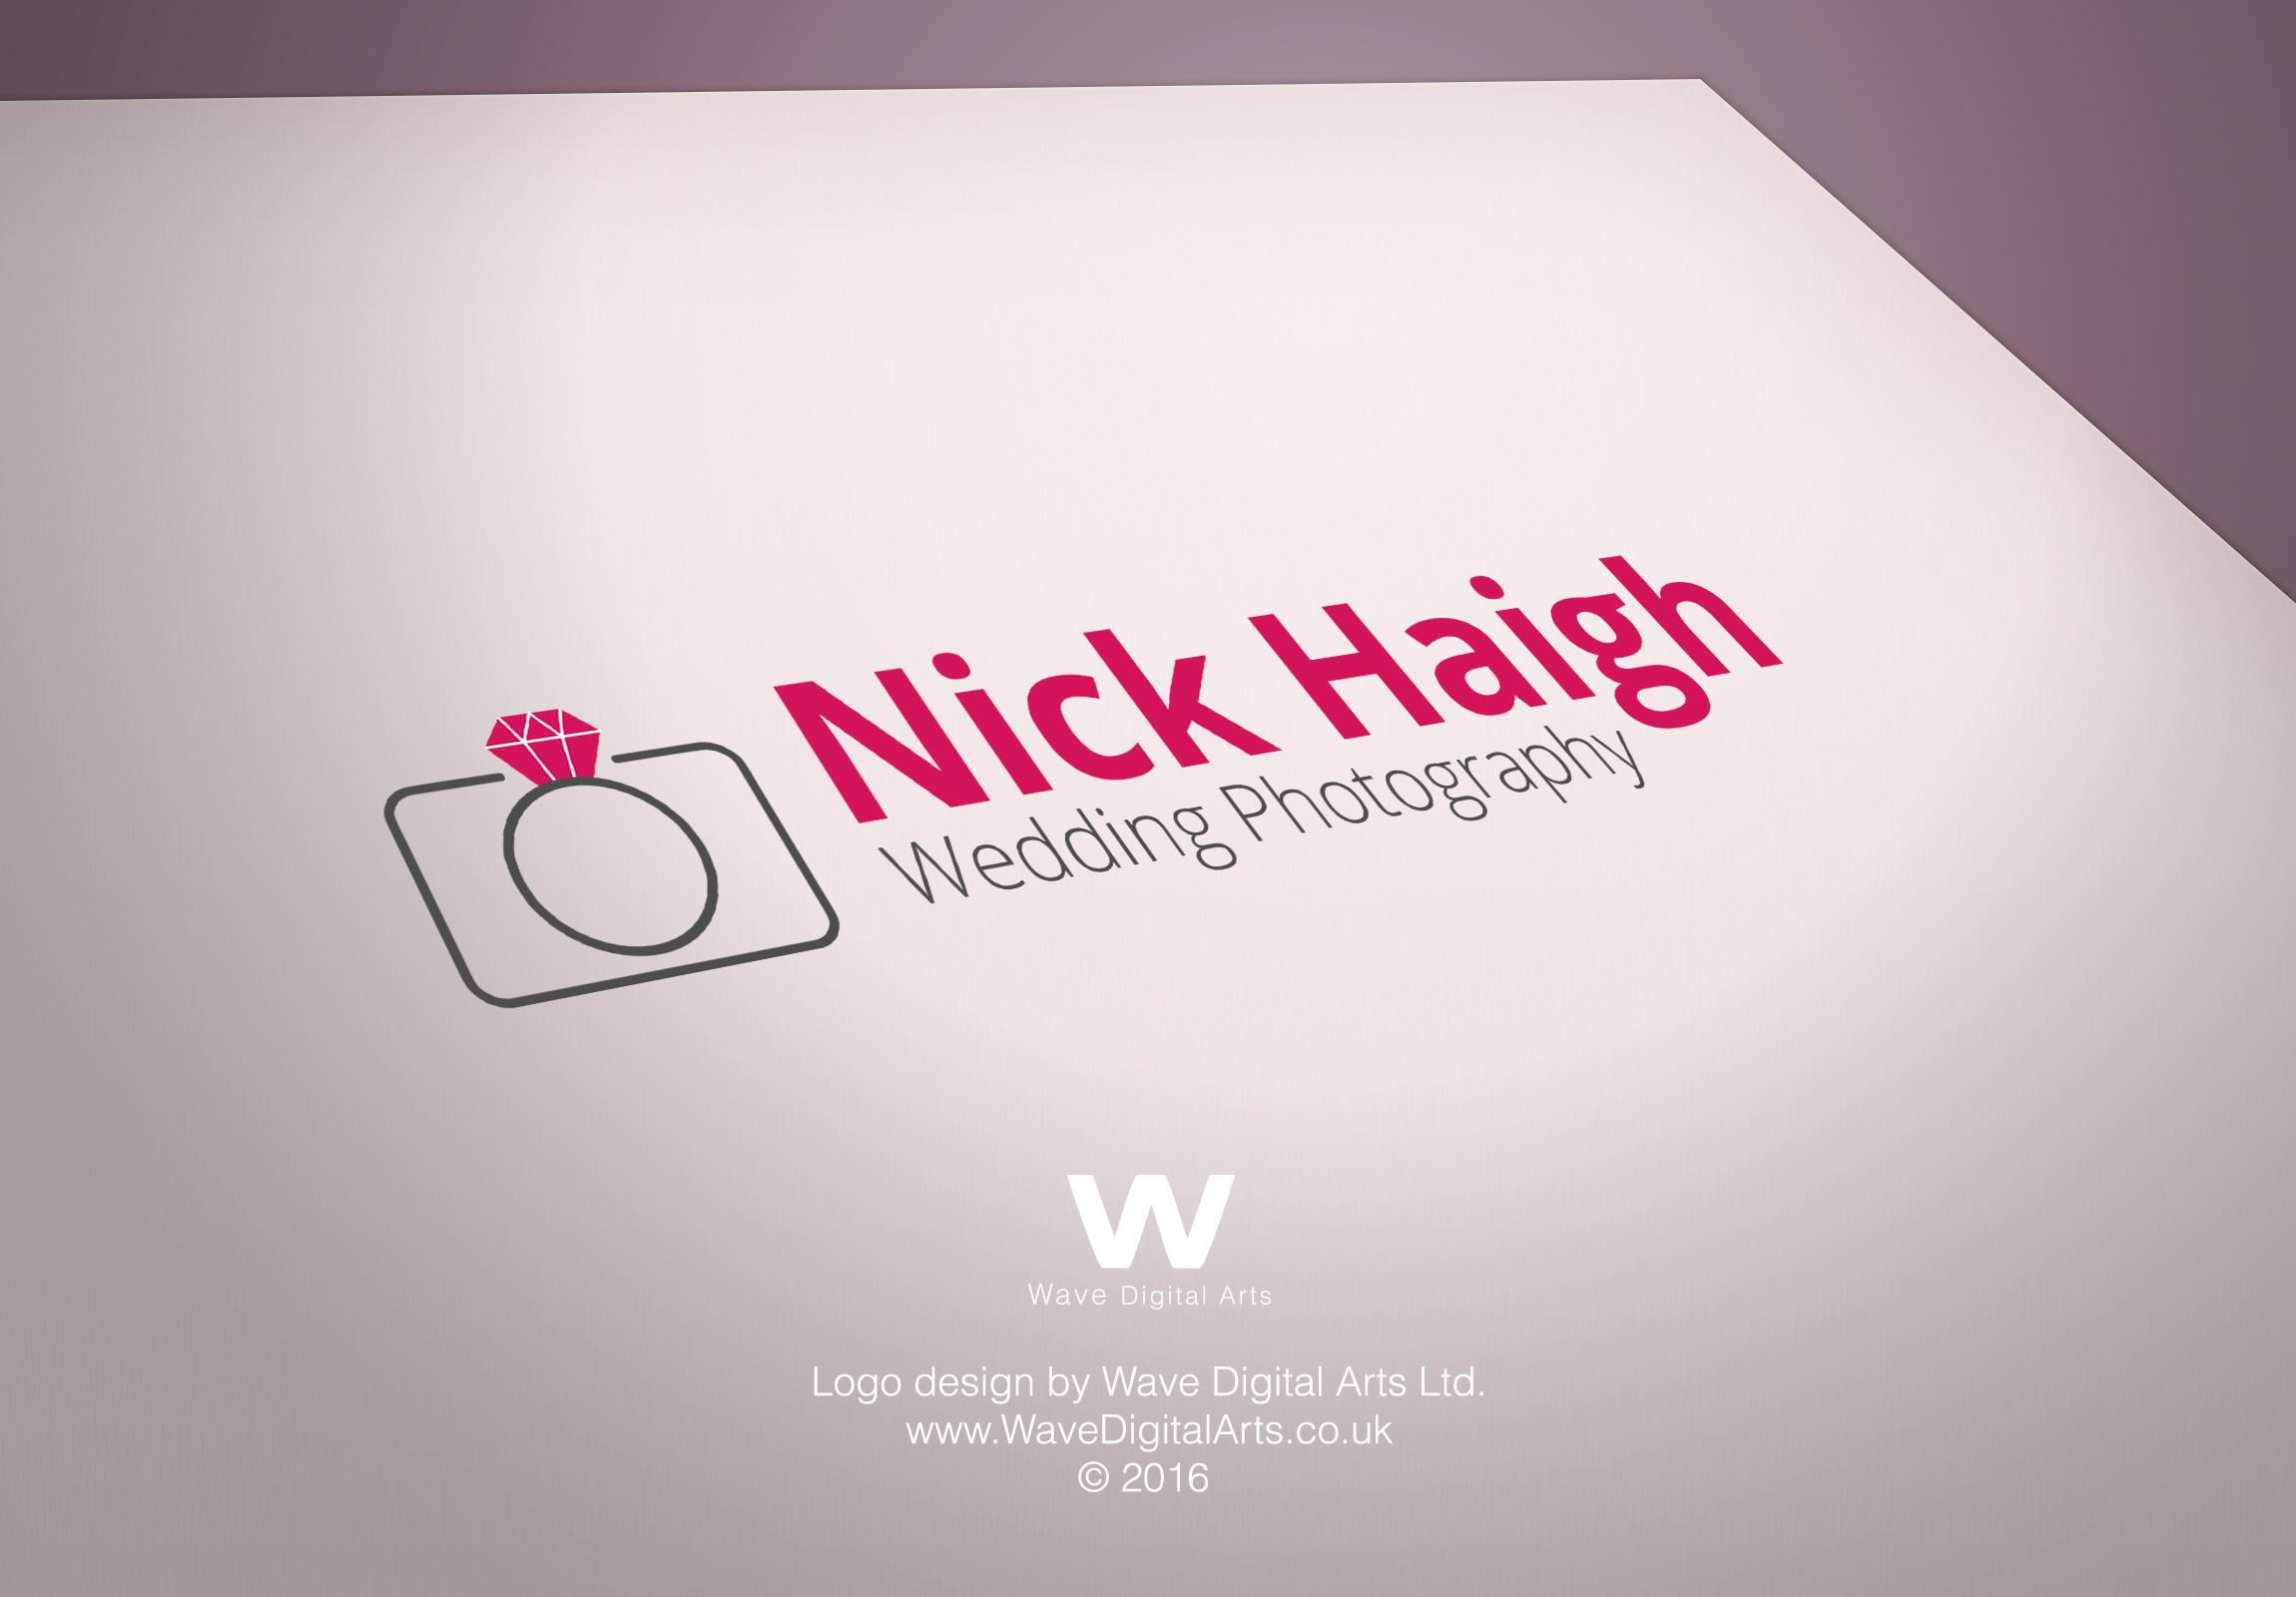 Nick Haigh Logo Design